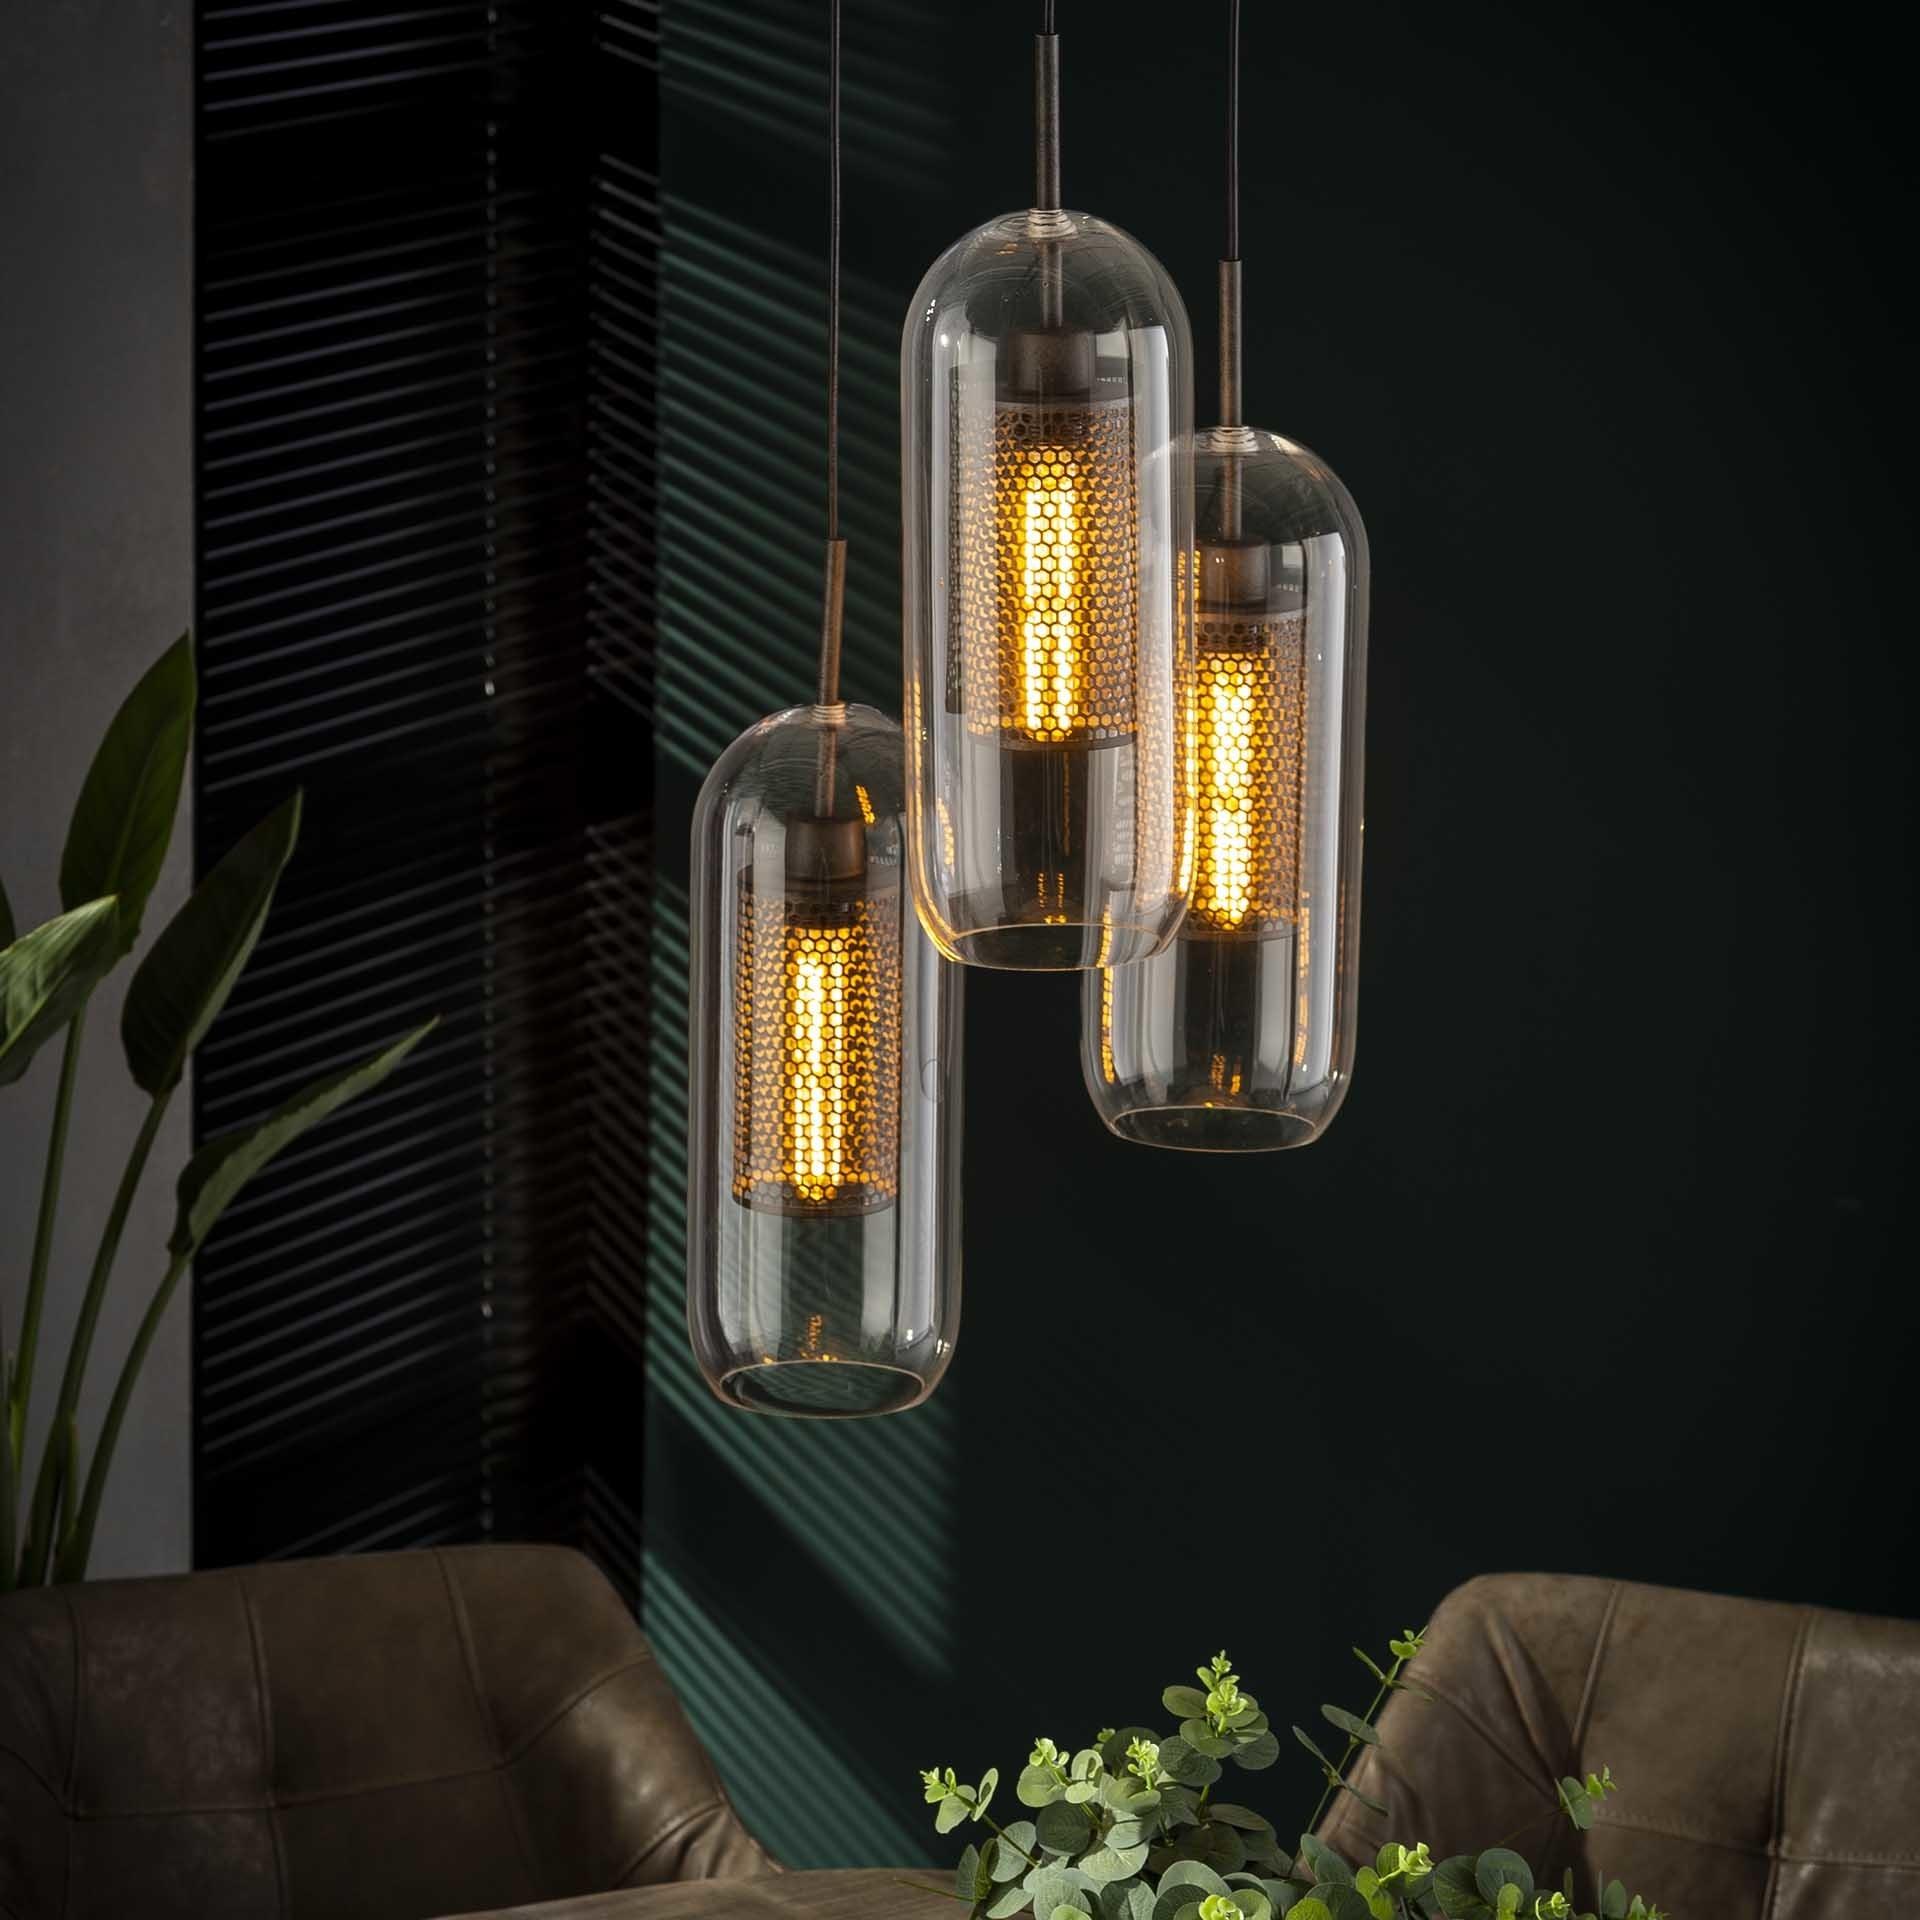 Hanglamp Lecco - 3L - Transparant - Showroom Model